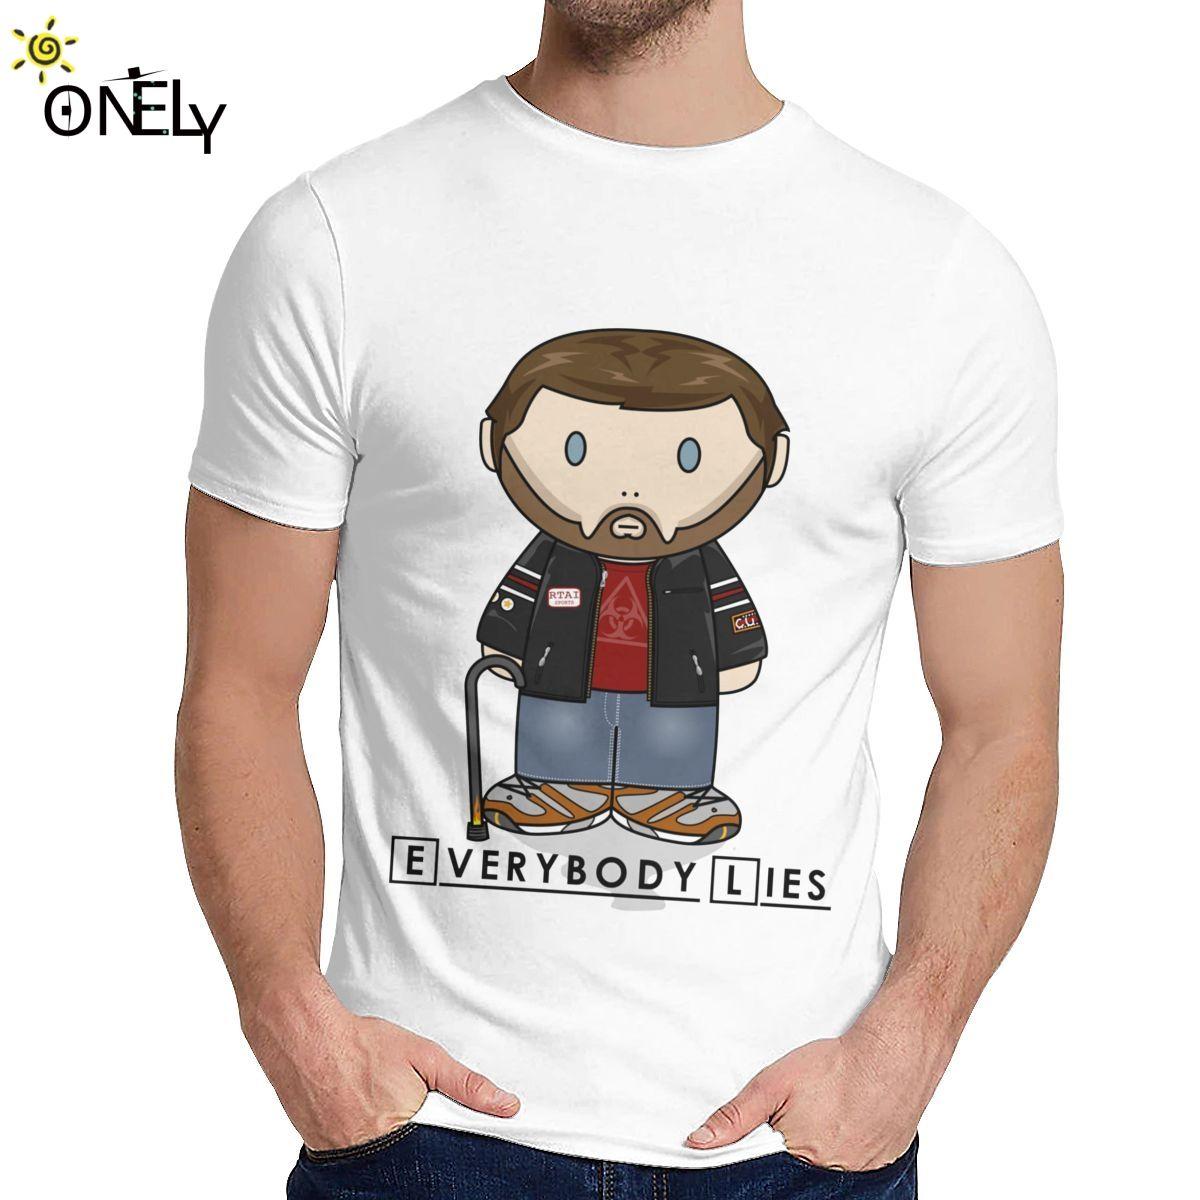 Dr House MD Все Lies Minifolk T Shirt Мода Crewneck Повседневный унисекс 100% хлопок плюс размер футболку